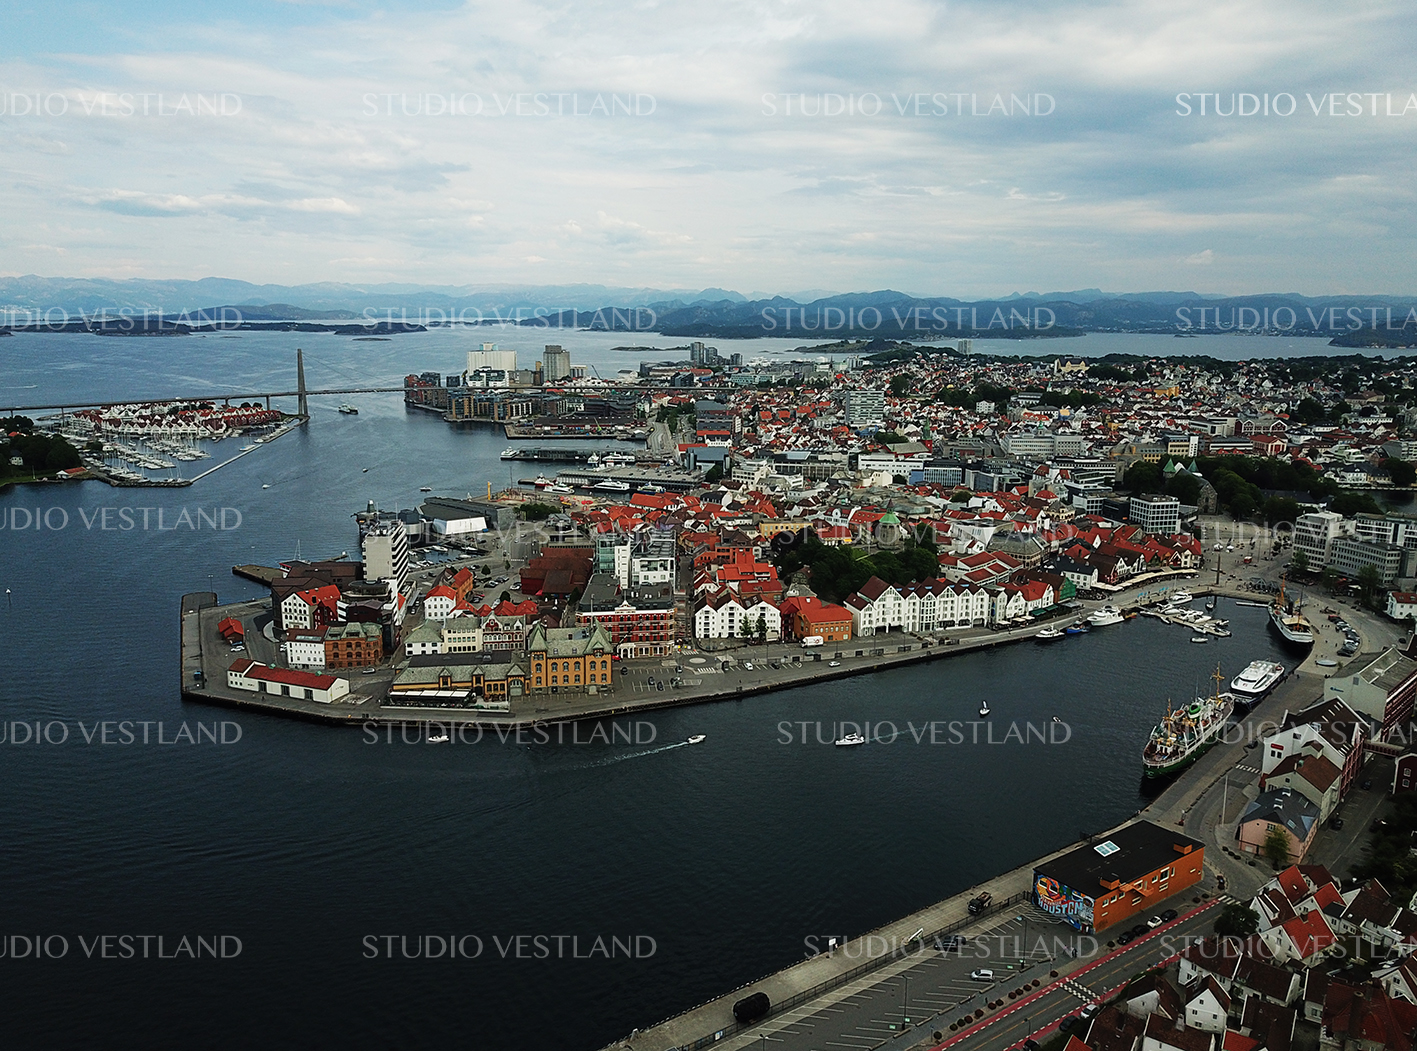 Studio Vestland - Stavanger 26